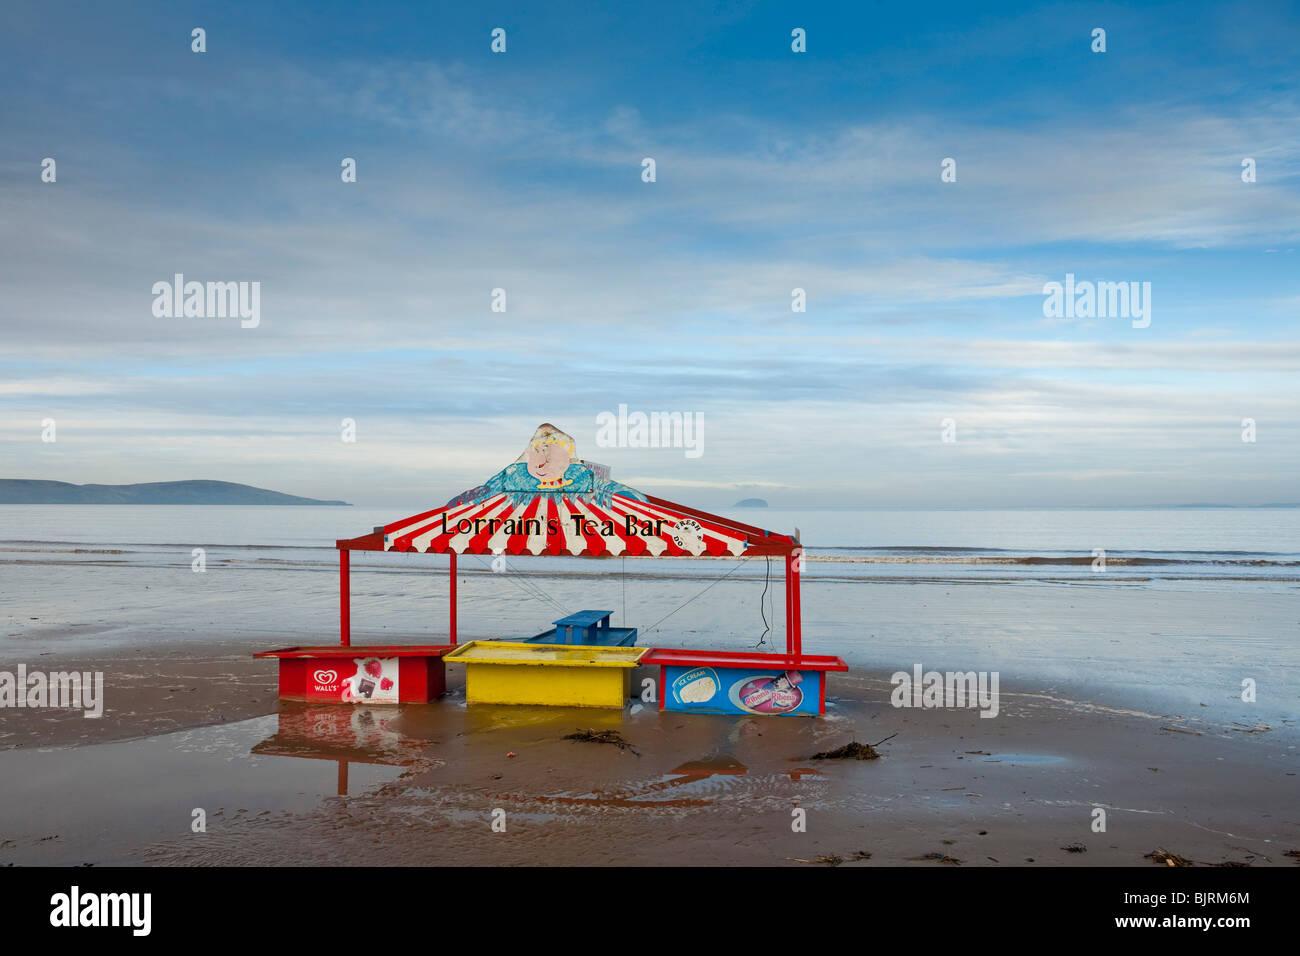 Weston Super Mare, Somerset, UK, the beach in winter, Lorraine's Tea House - Stock Image